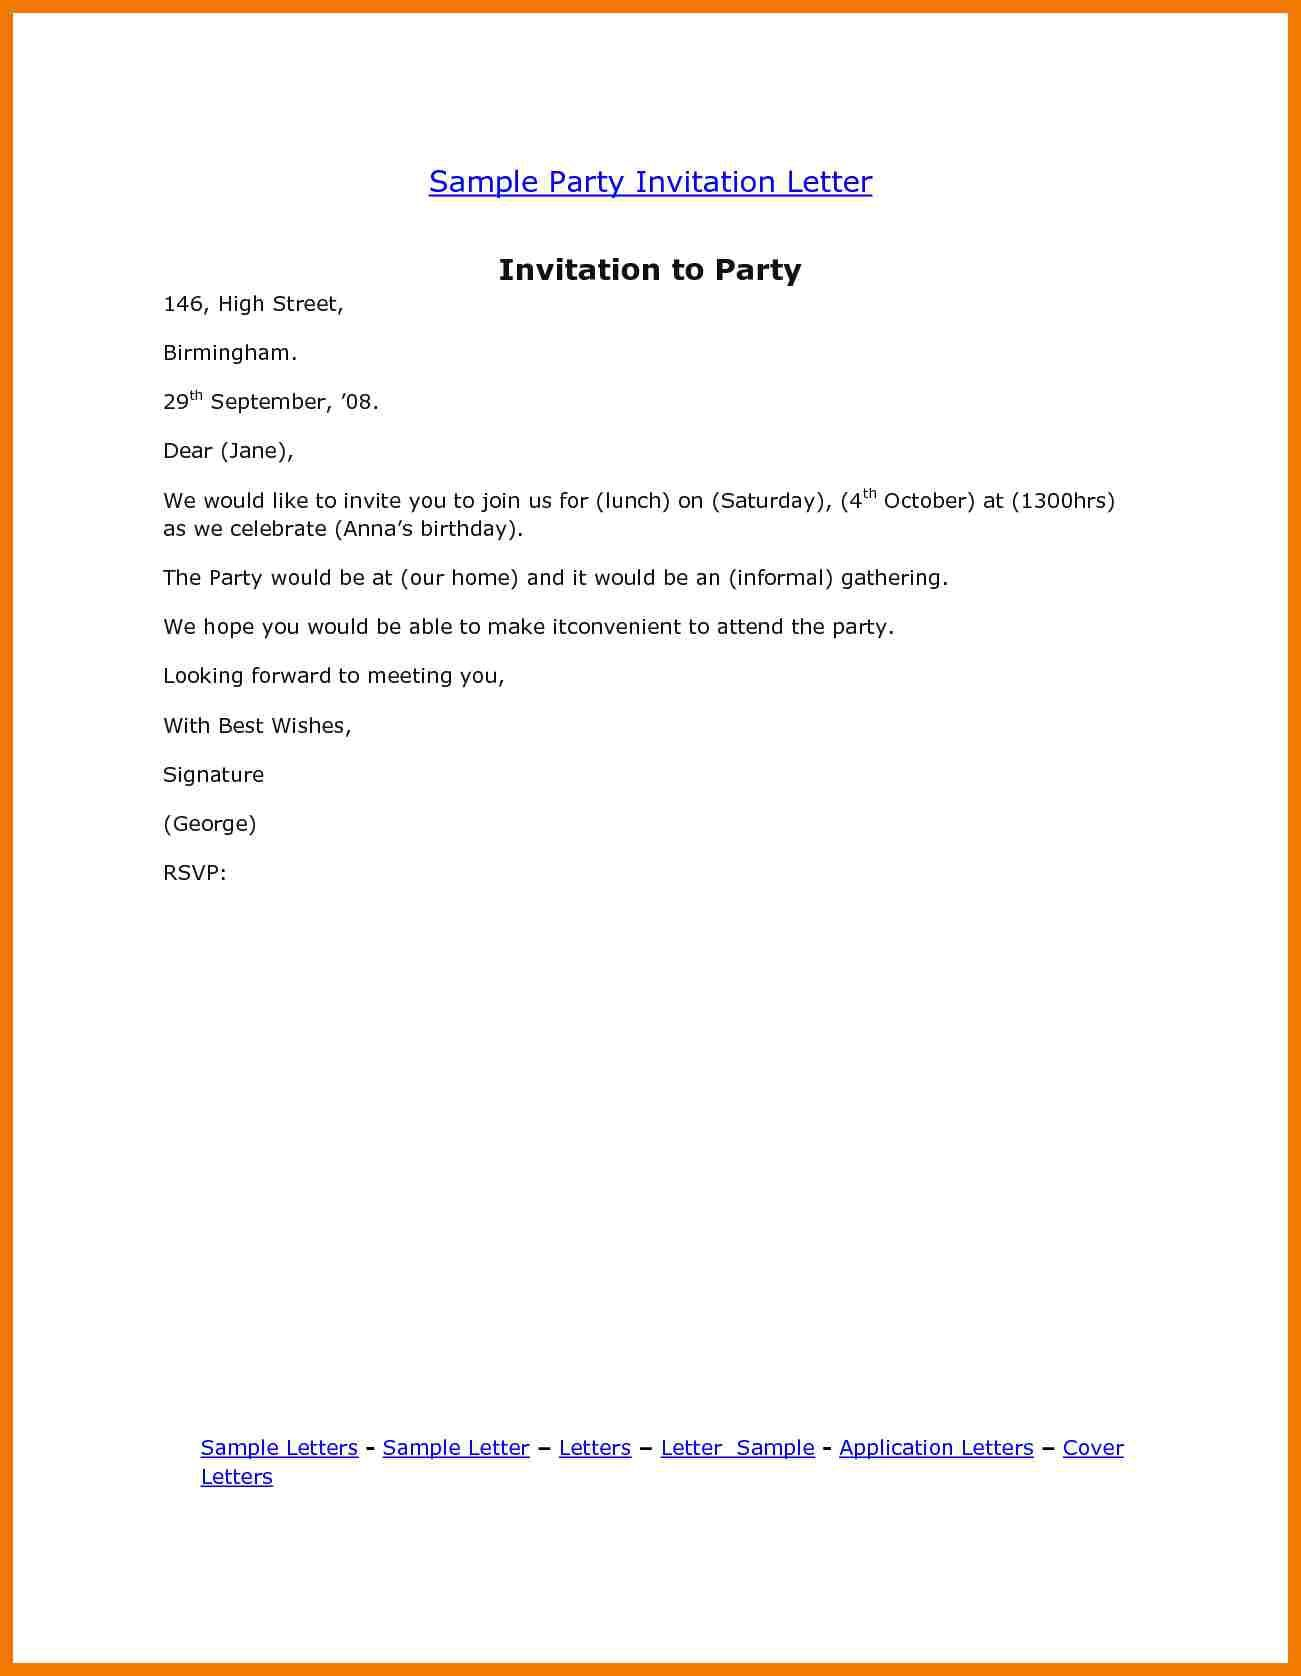 Birthday Invitation Template Birthday Invitation Letter Template Birthday Invitation Tem In 2020 Birthday Invitations Birthday Invitation Message Party Invitations